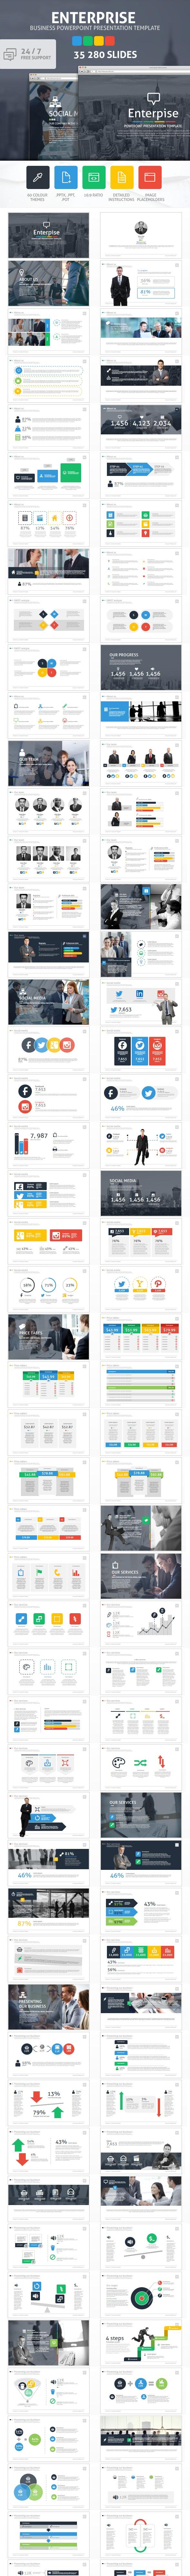 Enterprise Powerpoint Presentation Template - Business PowerPoint Templates